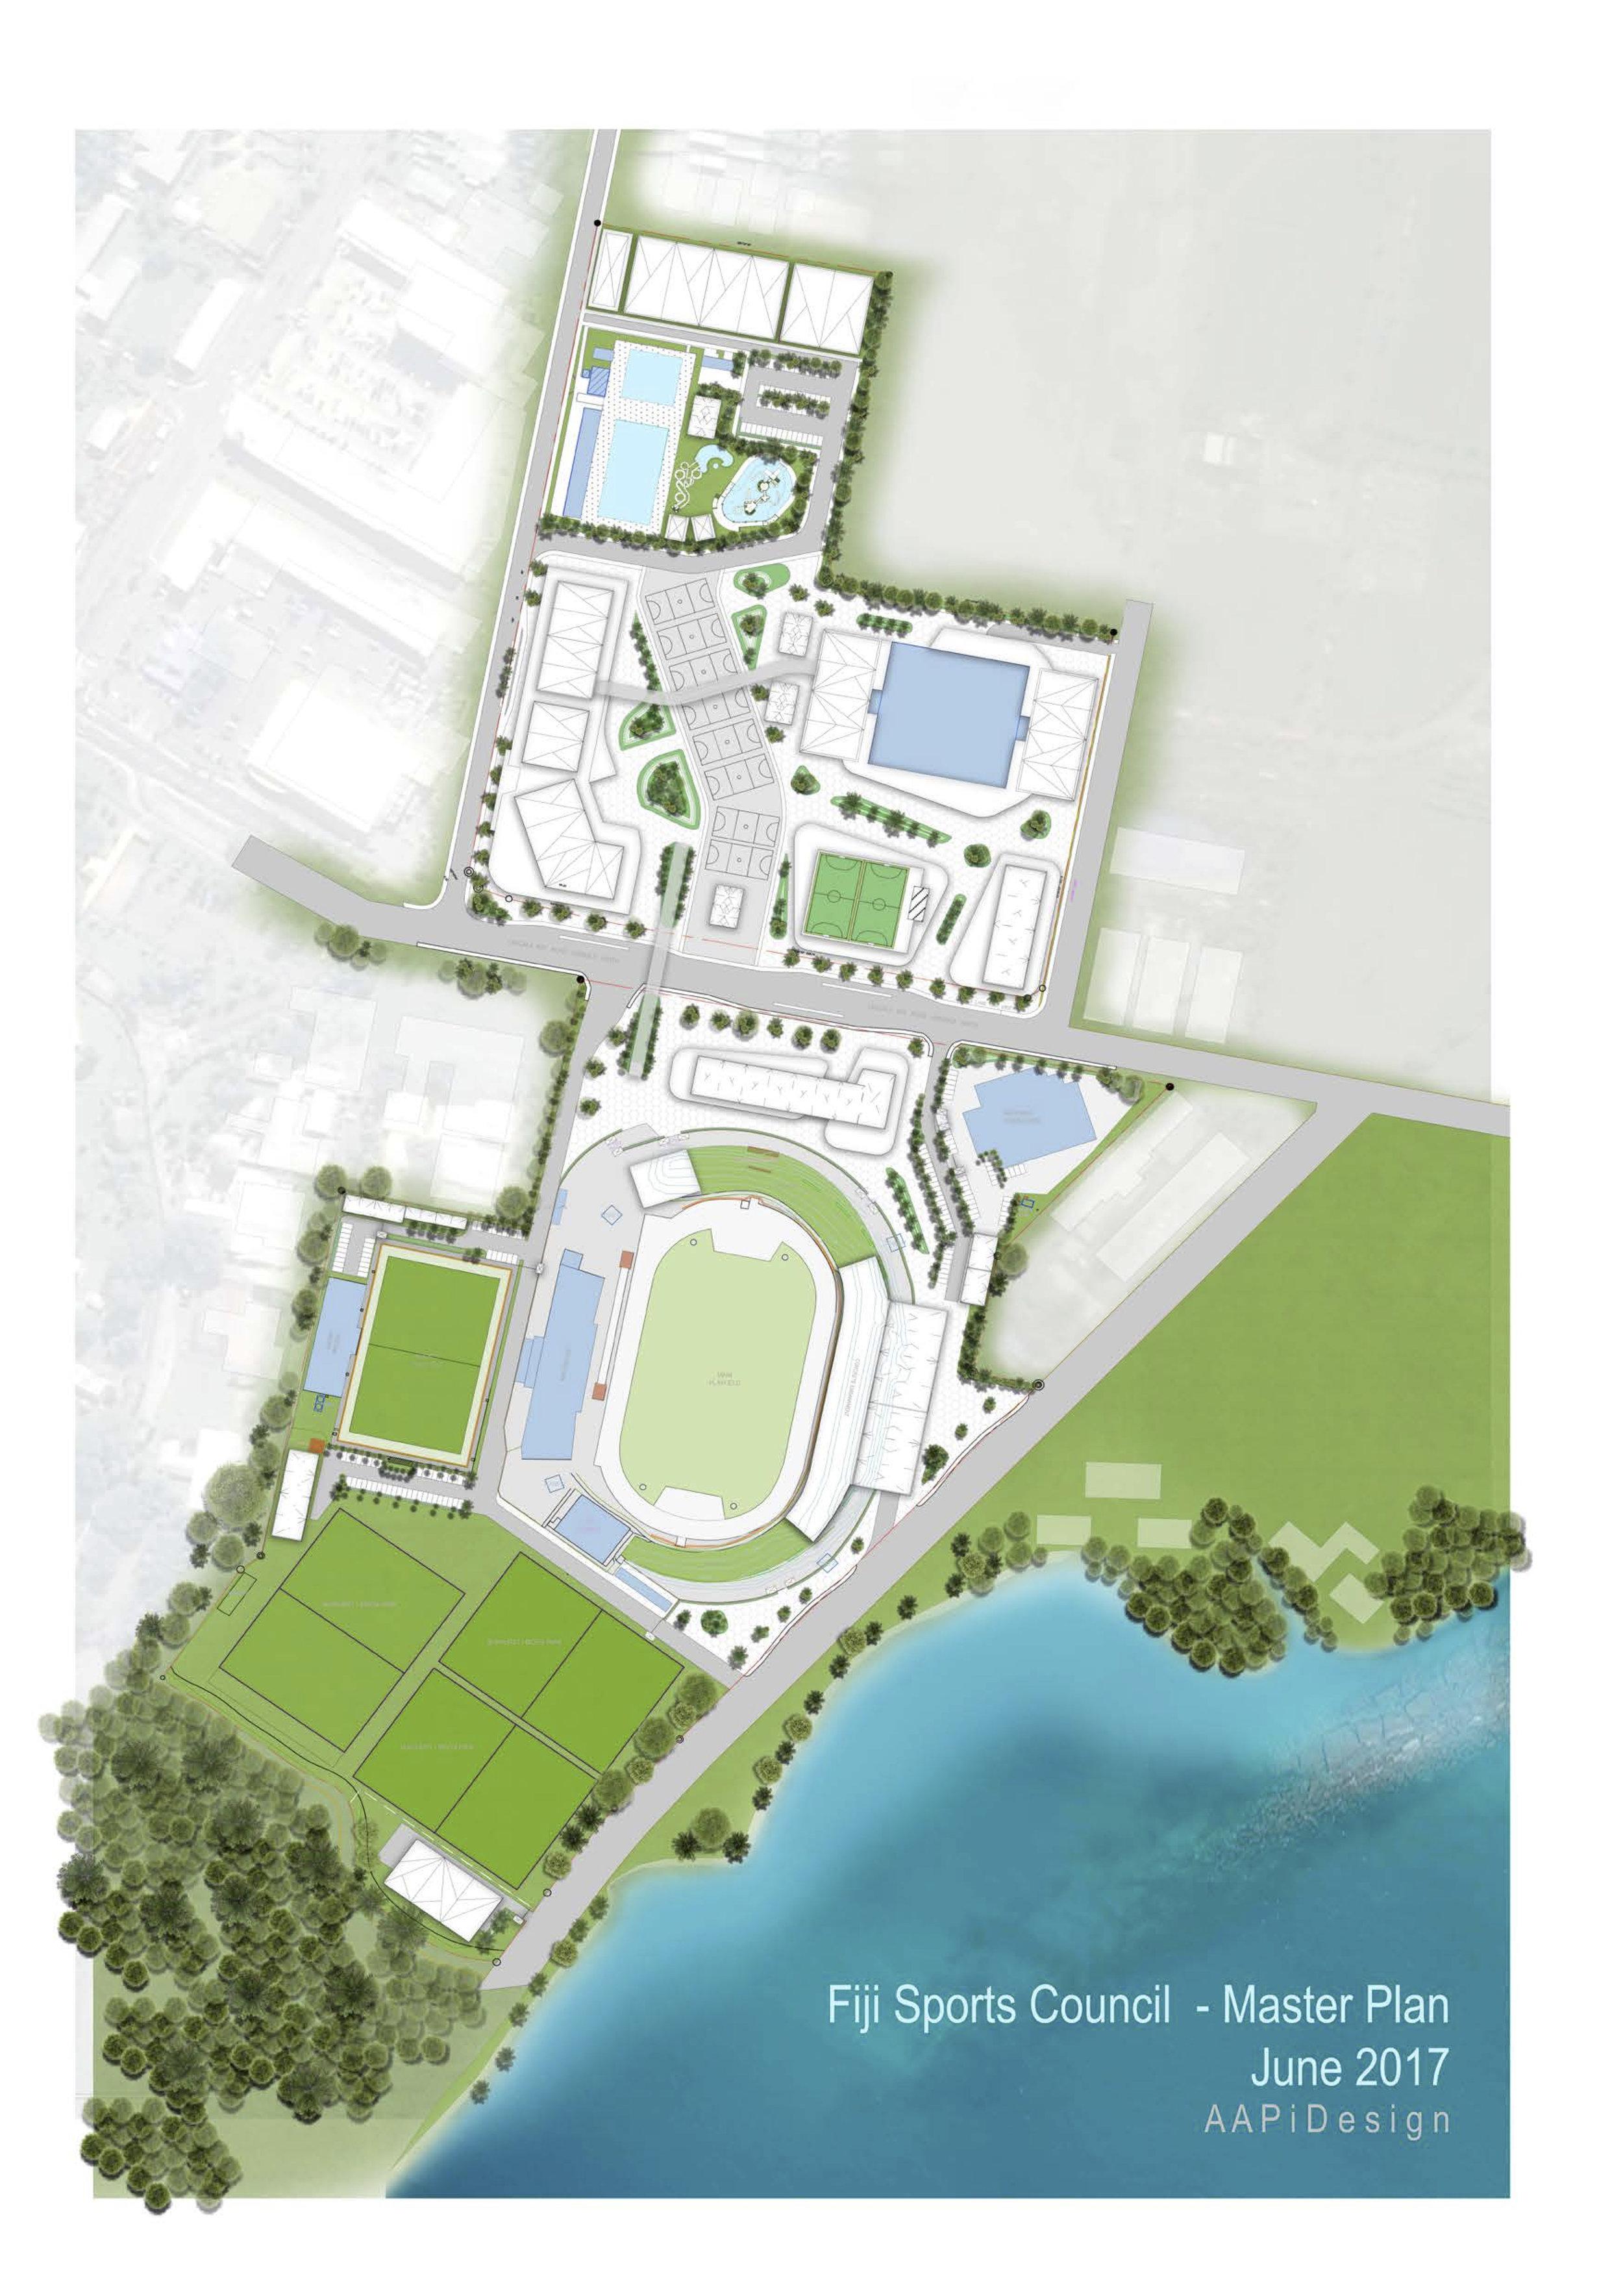 Fiji Sports Council Masterplanning